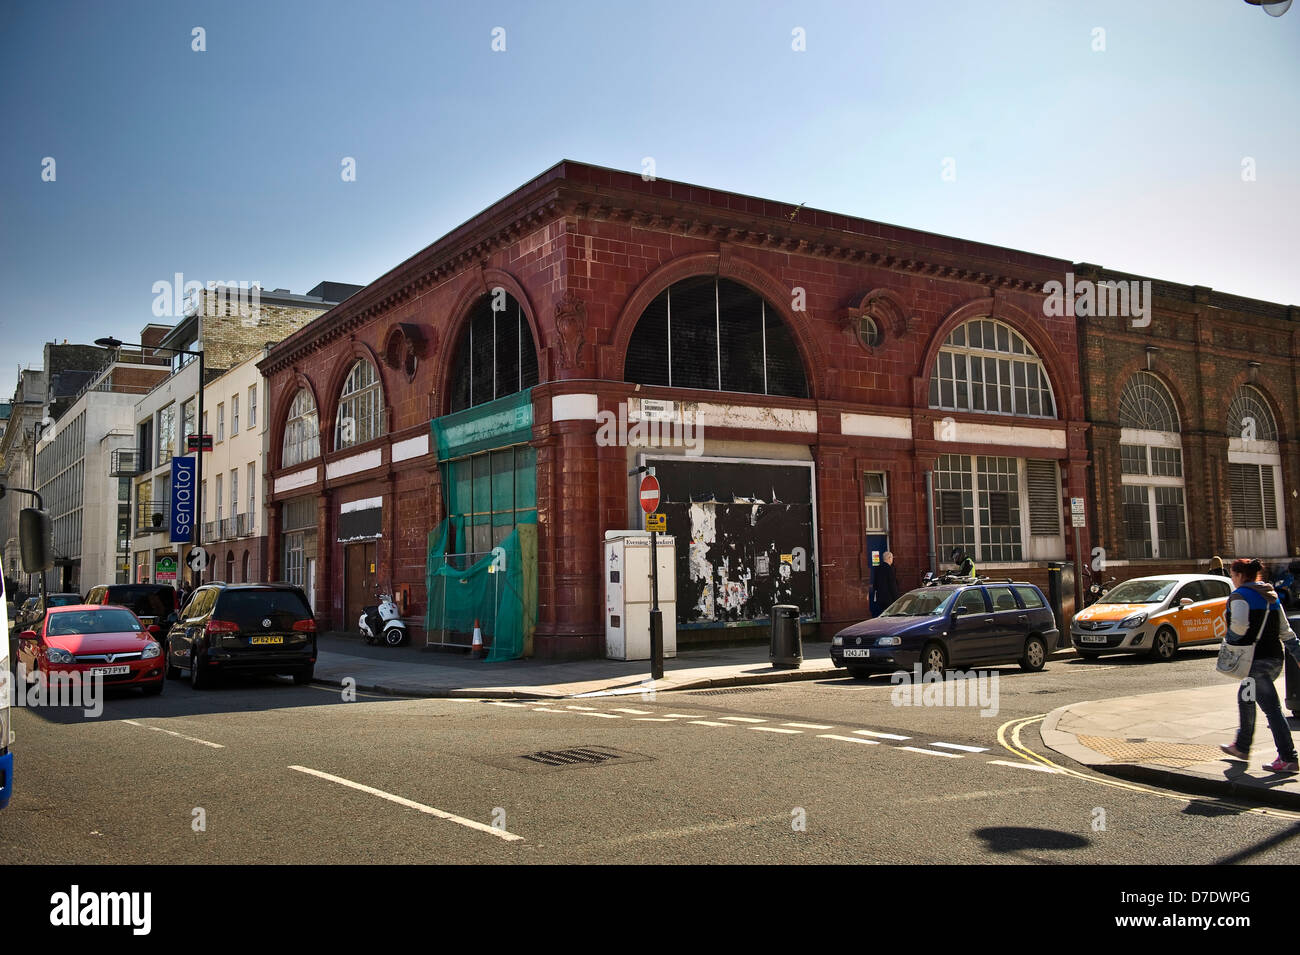 The old entrance/exit for Euston Northern Line Underground Station, London, UK - Stock Image